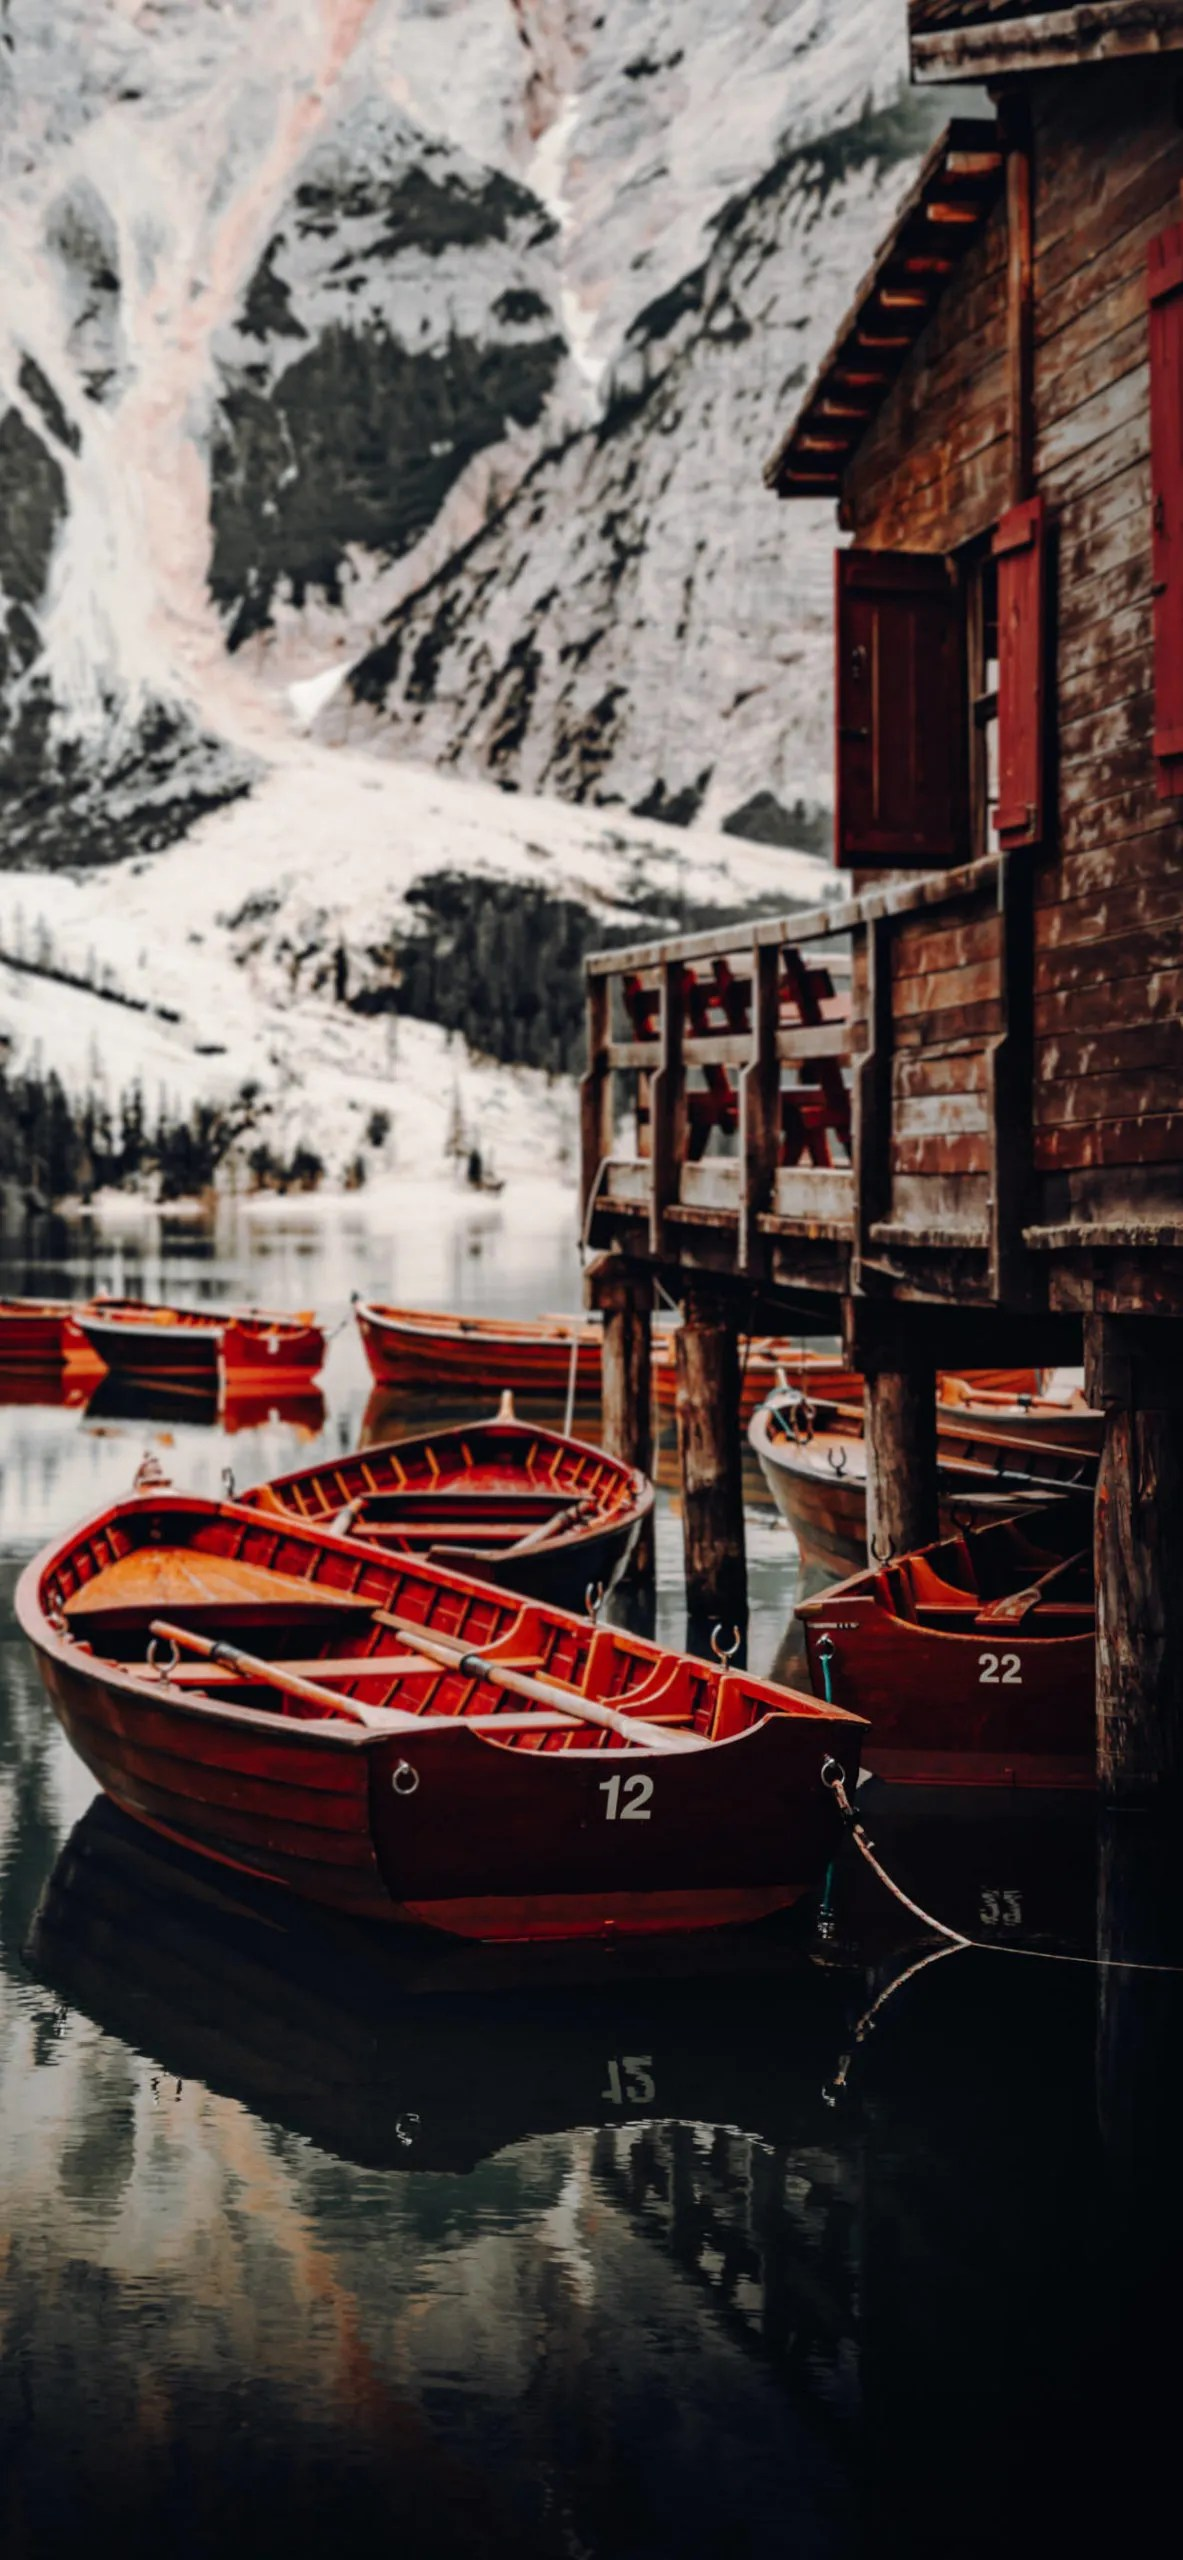 iPhone wallpapers lago di braies scaled River